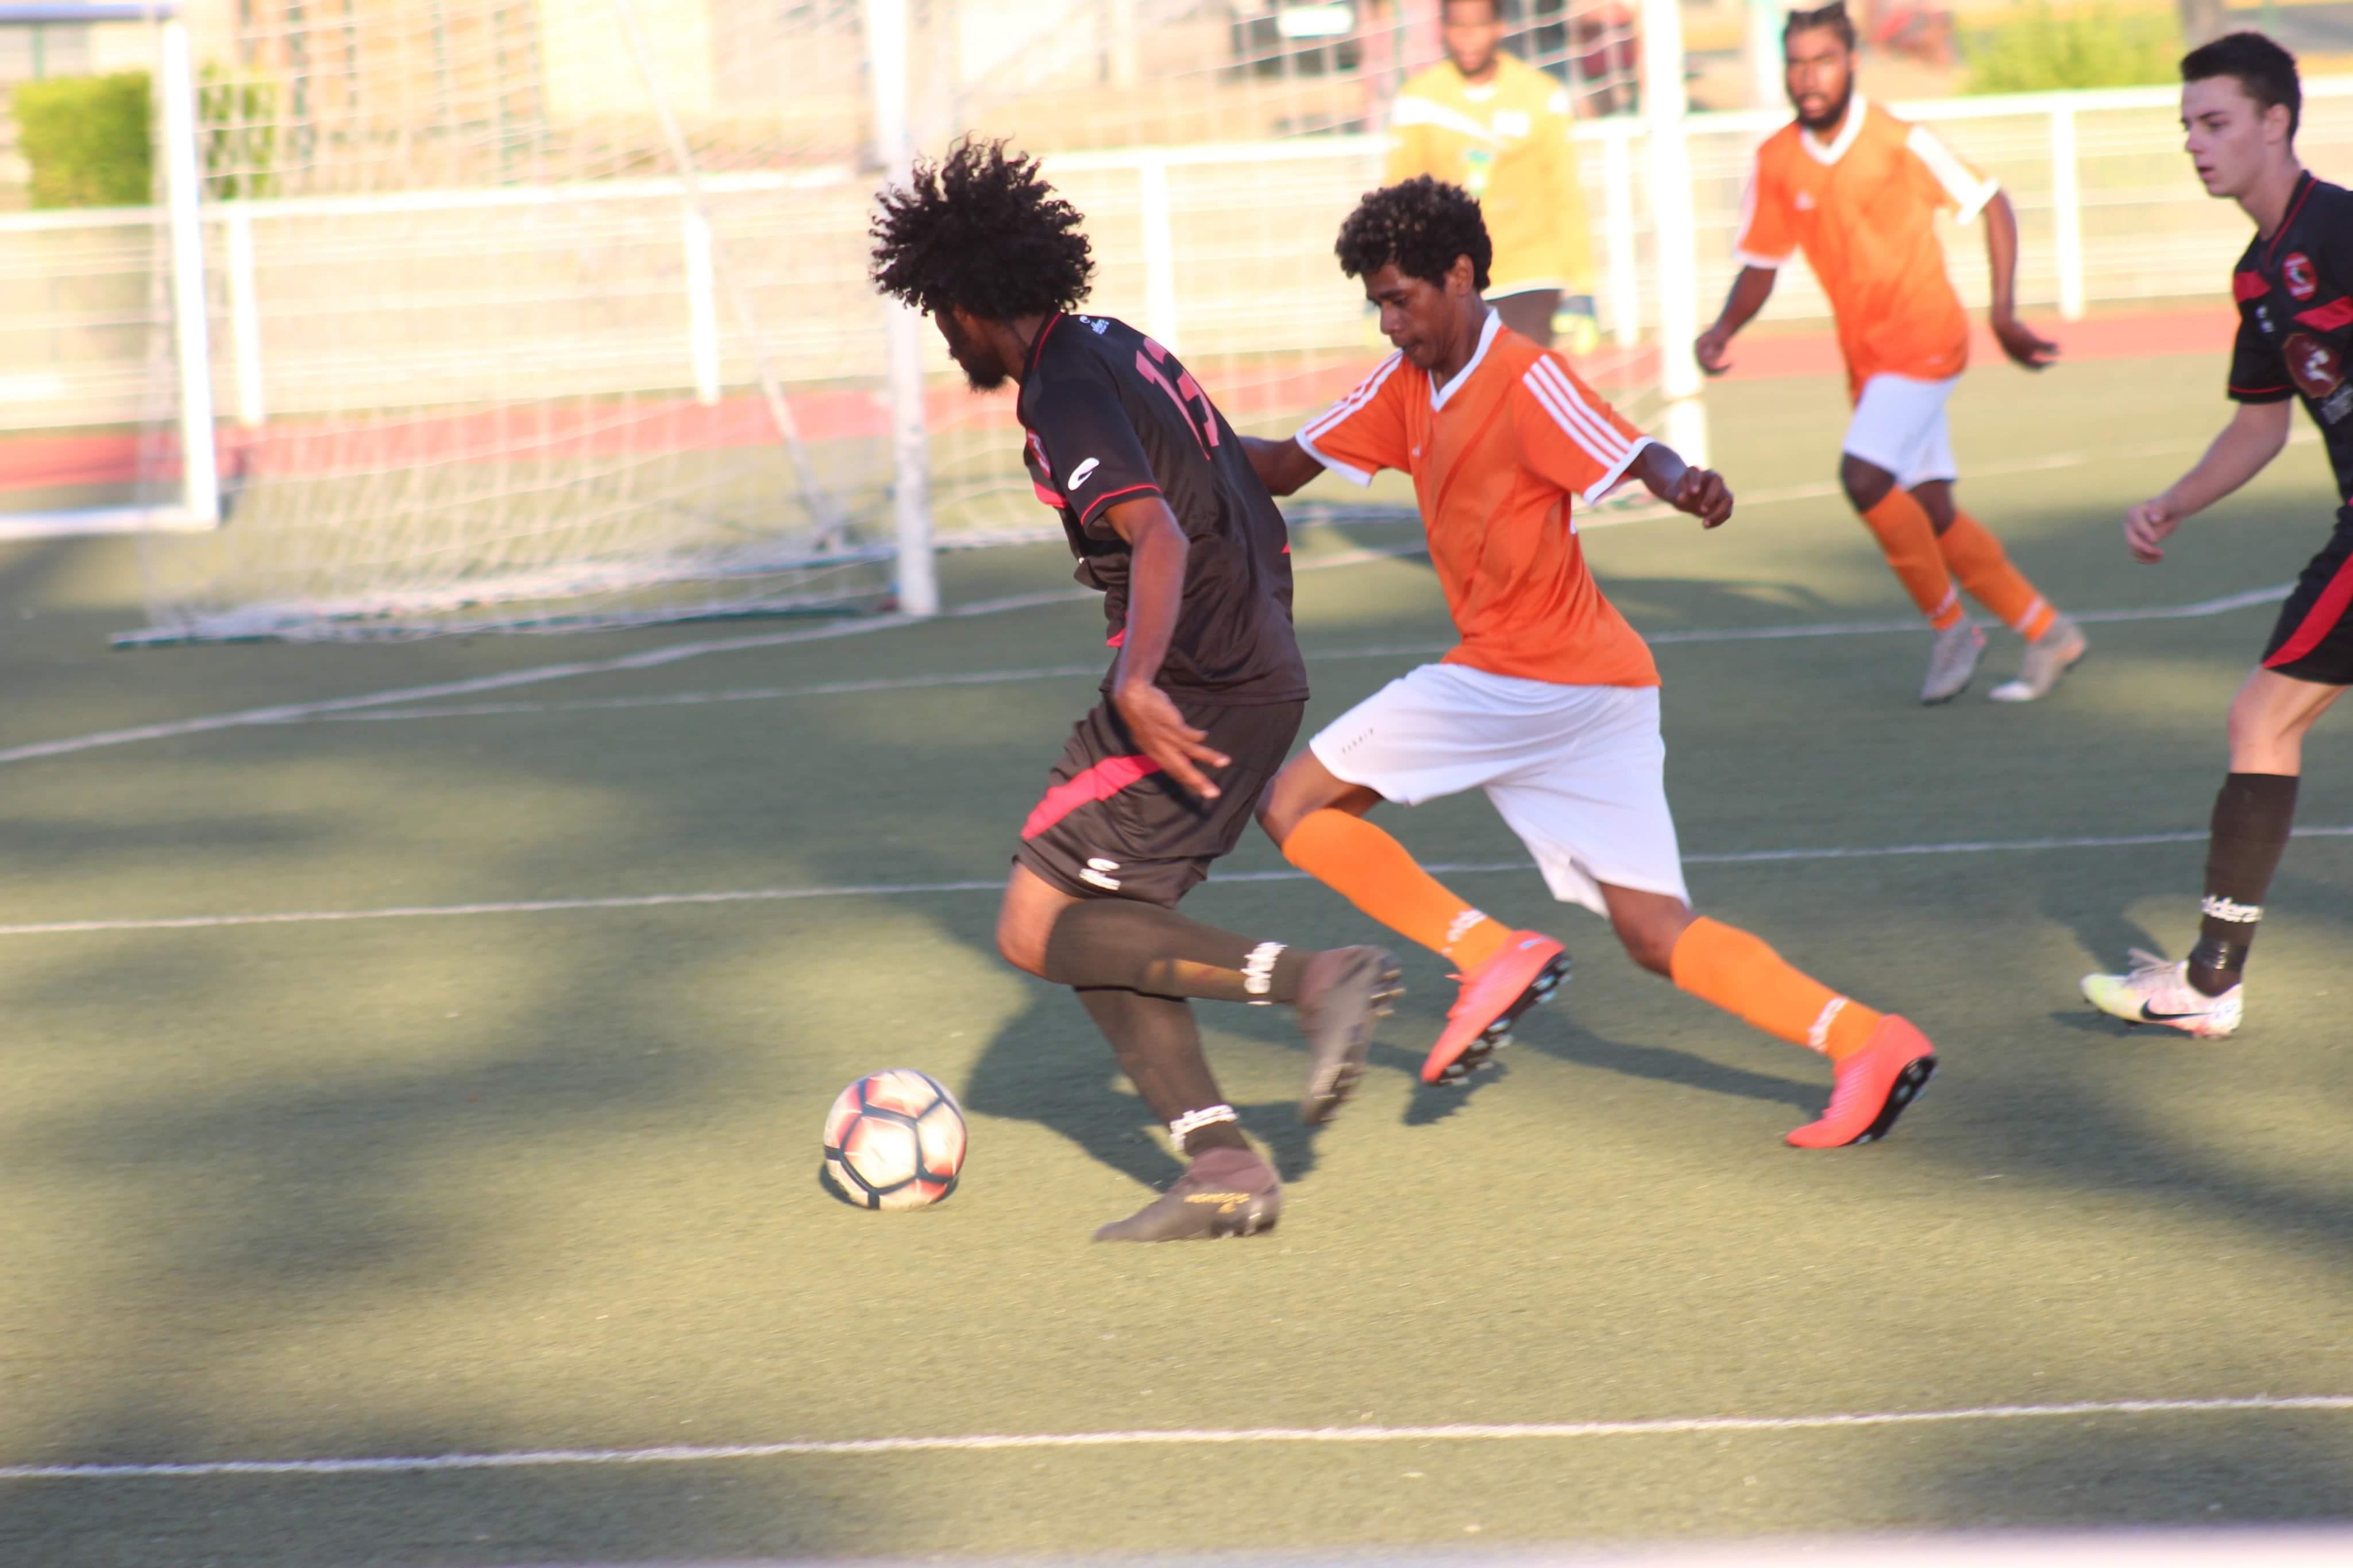 REPRISE IMMINENTE / Super Ligue - Super Ligue Futsal - U18 fédéral (programme complet)